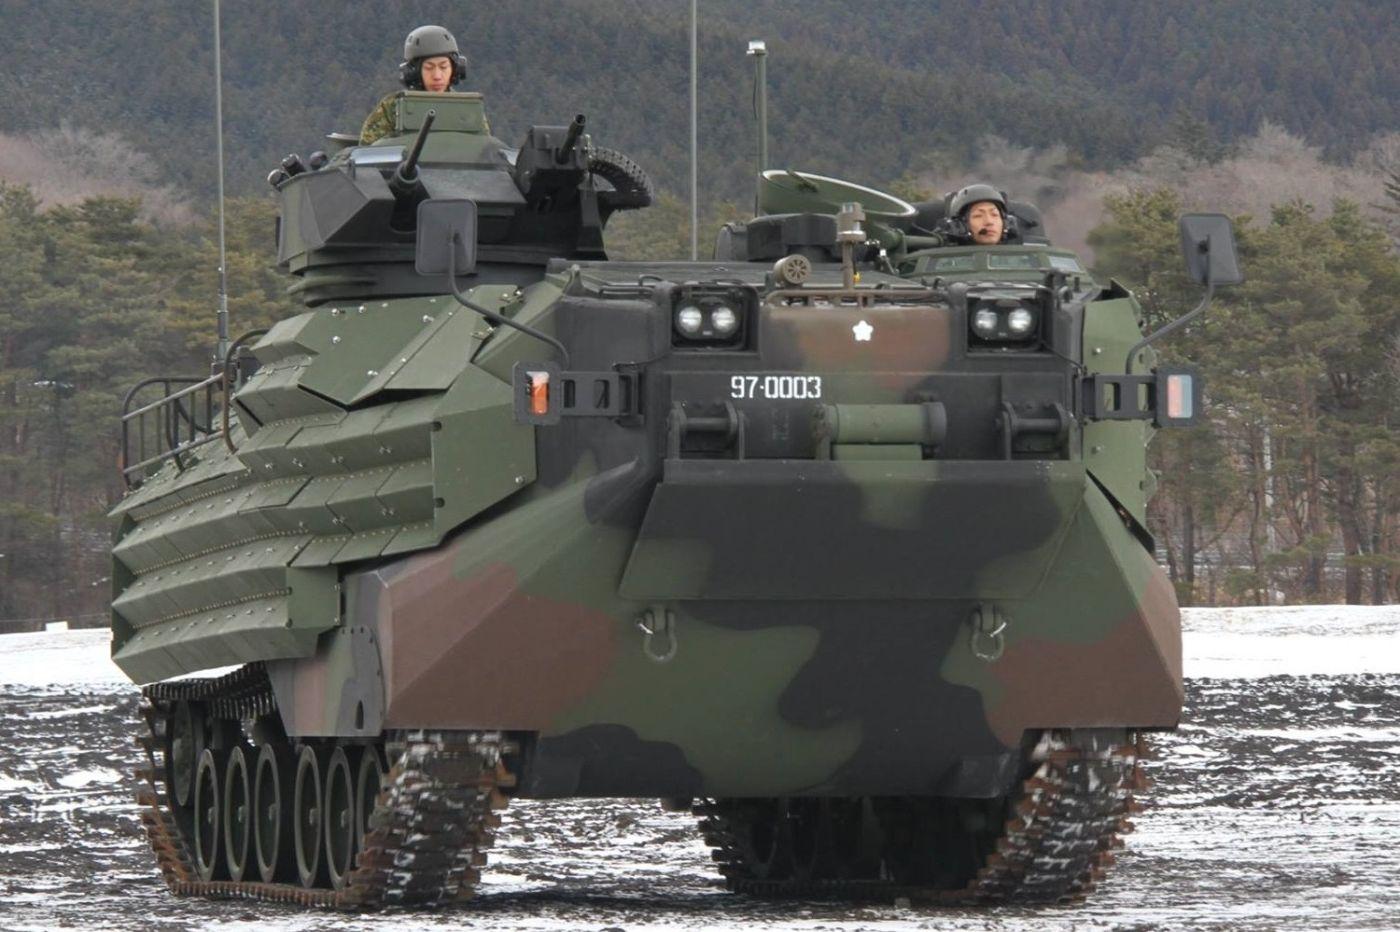 AAV Japońskich Lądowych Sił Samoobrony (fot. ministerstwo obrony Japonii, Creative Commons Attribution-Share Alike 4.0 International)